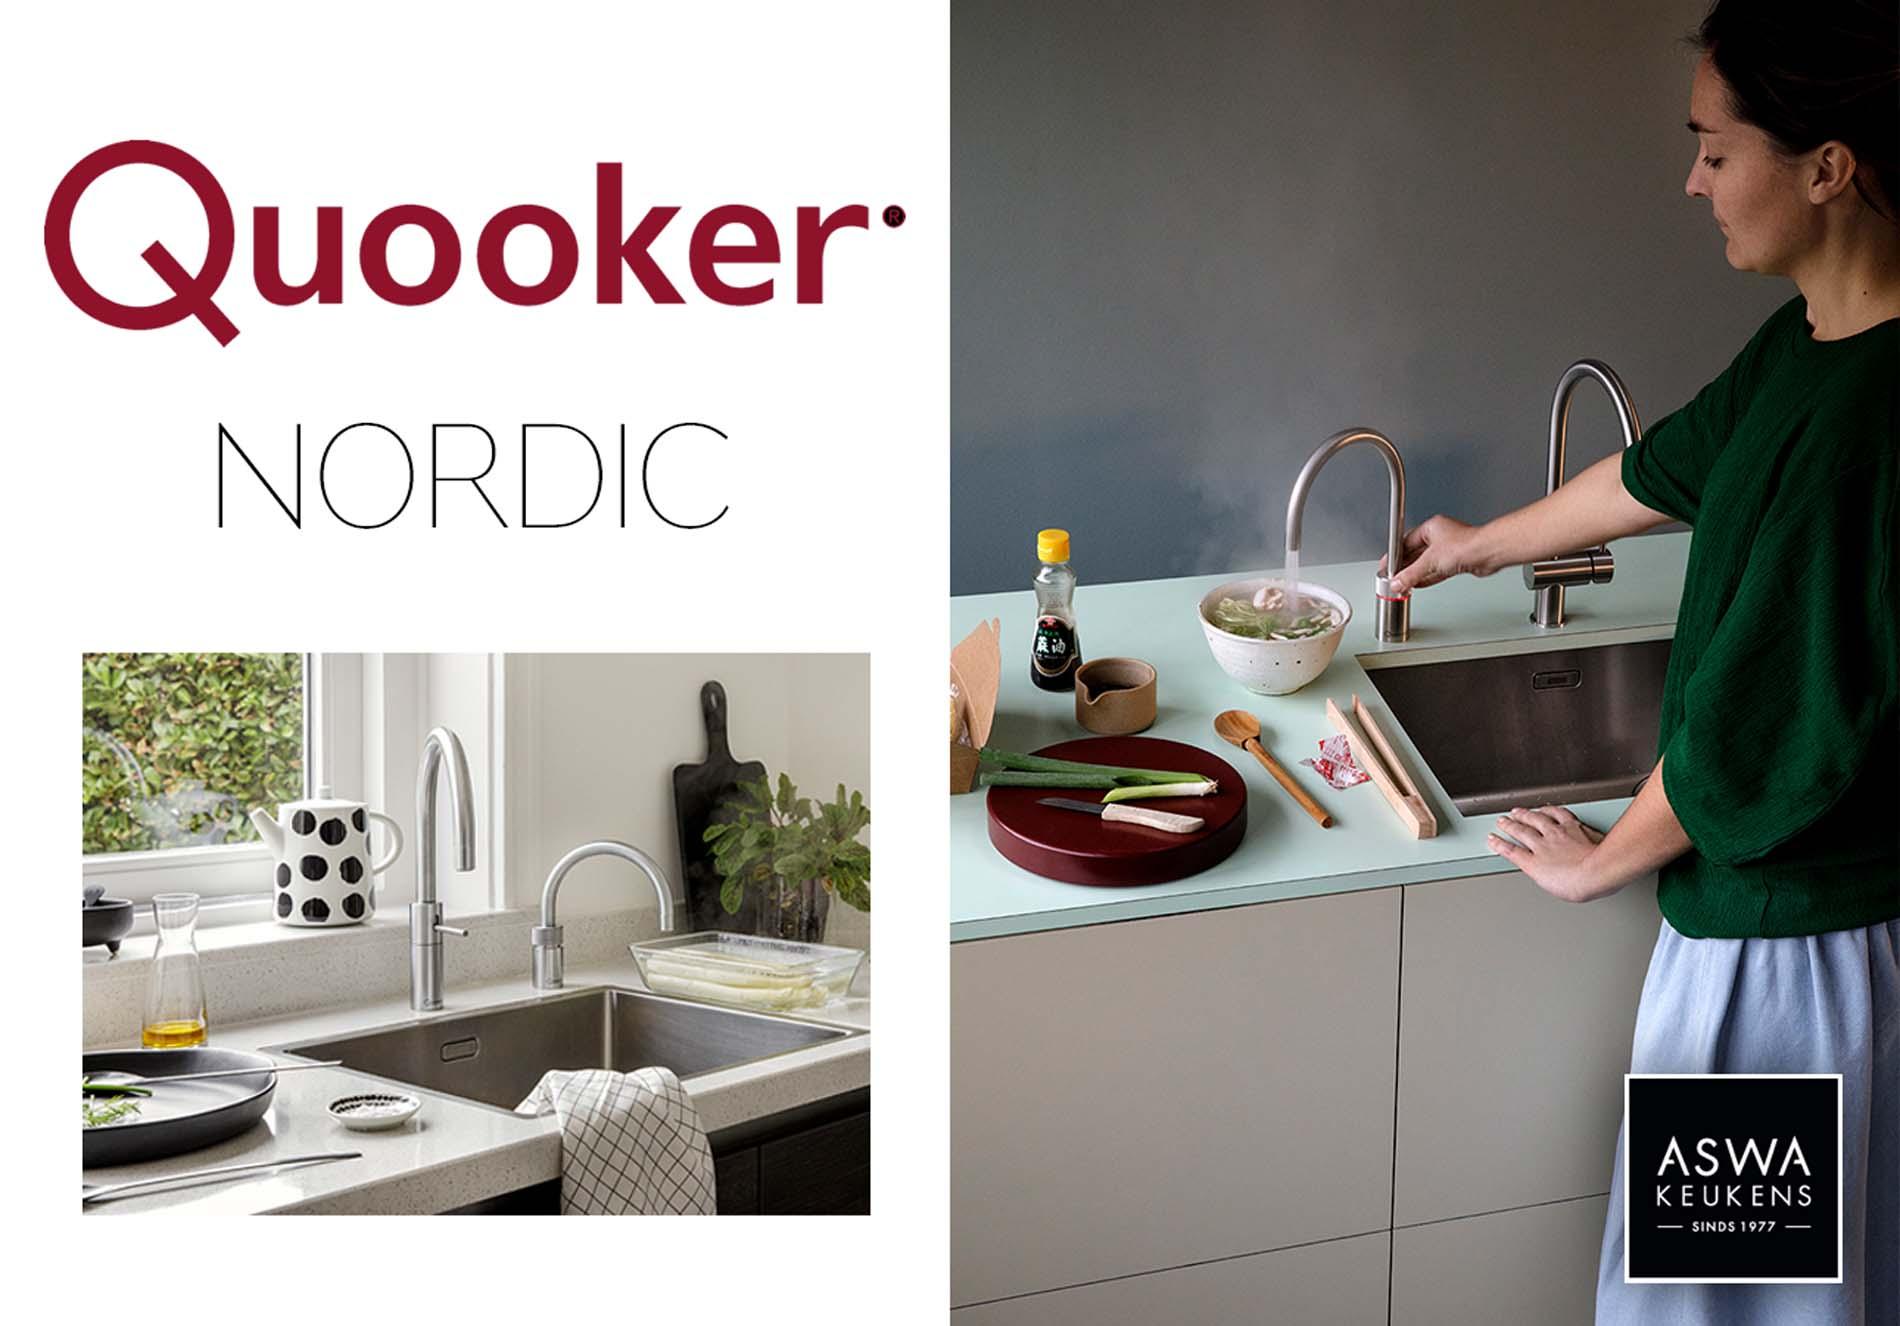 Quooker Nordic Kokendwaterkraan - ASWA Keukens keukenkraan